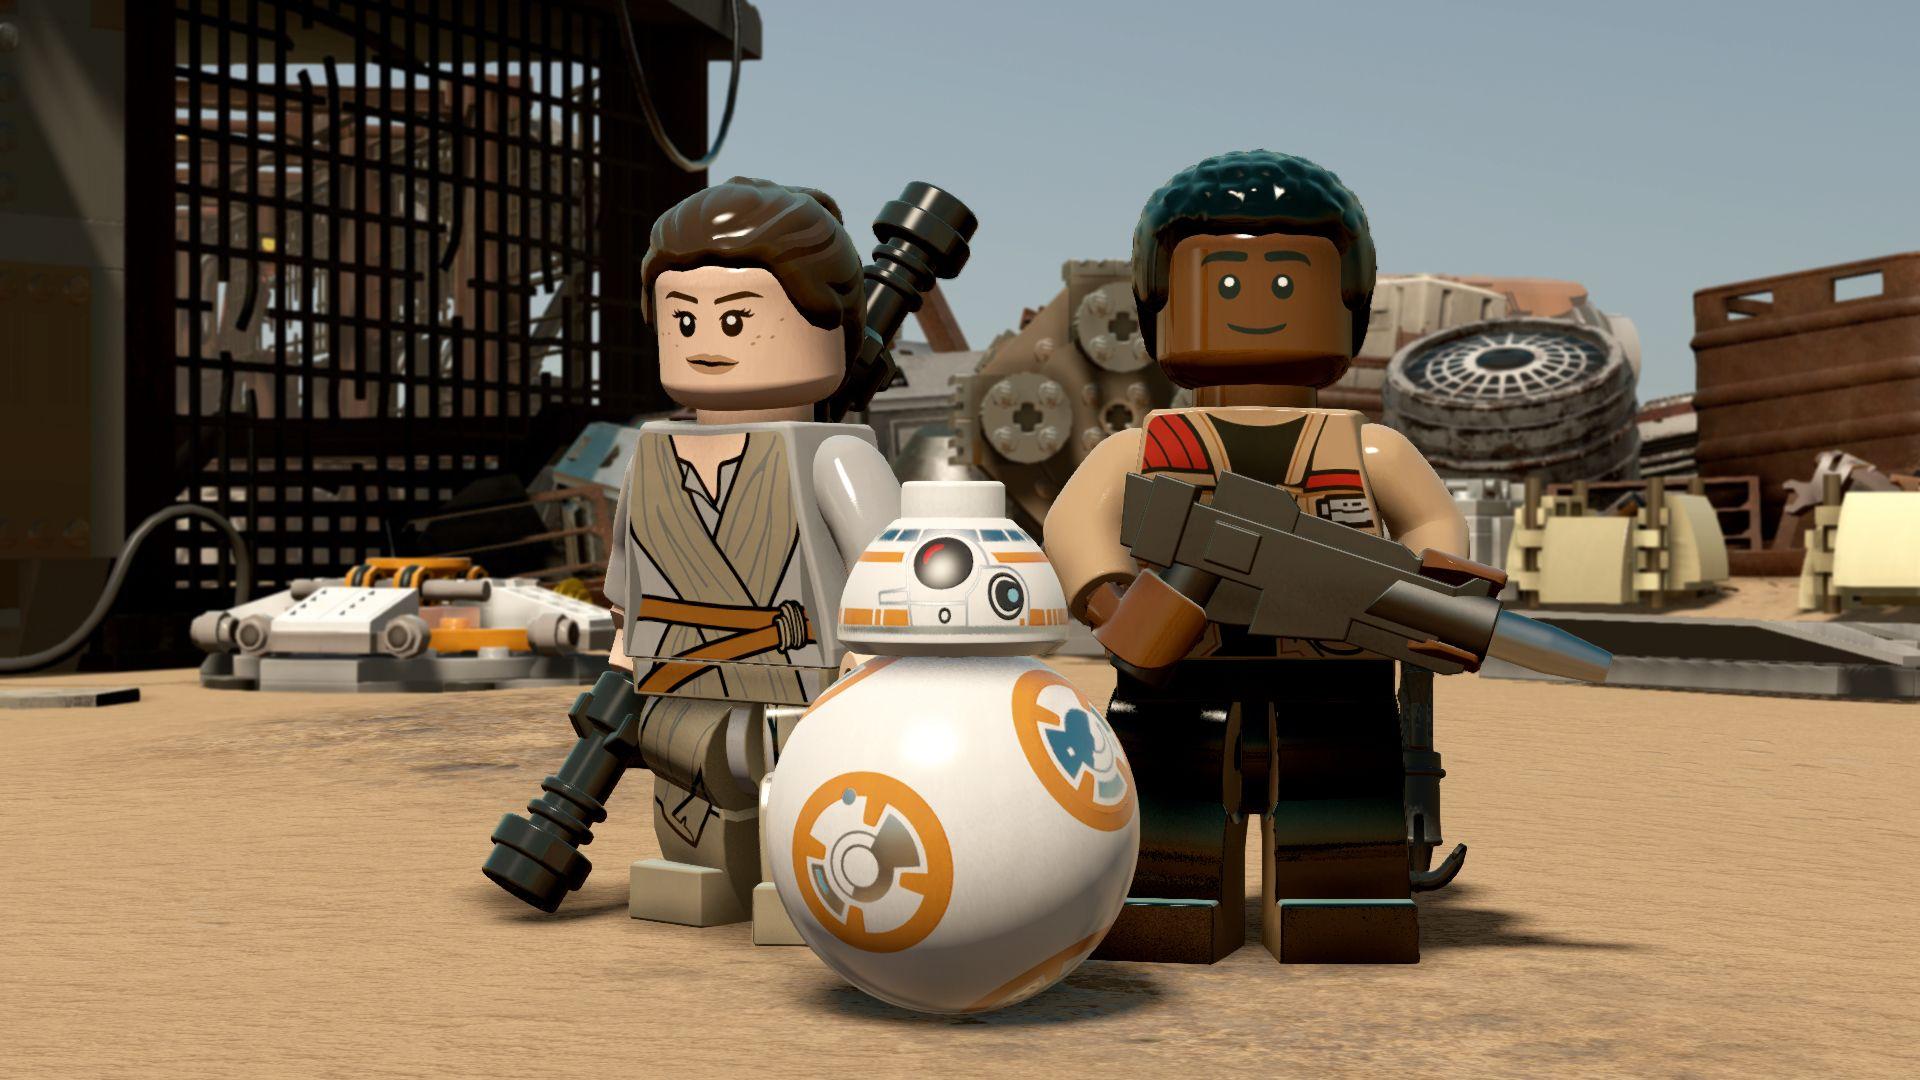 Screenshot of Lego Star Wars The Force Awakens